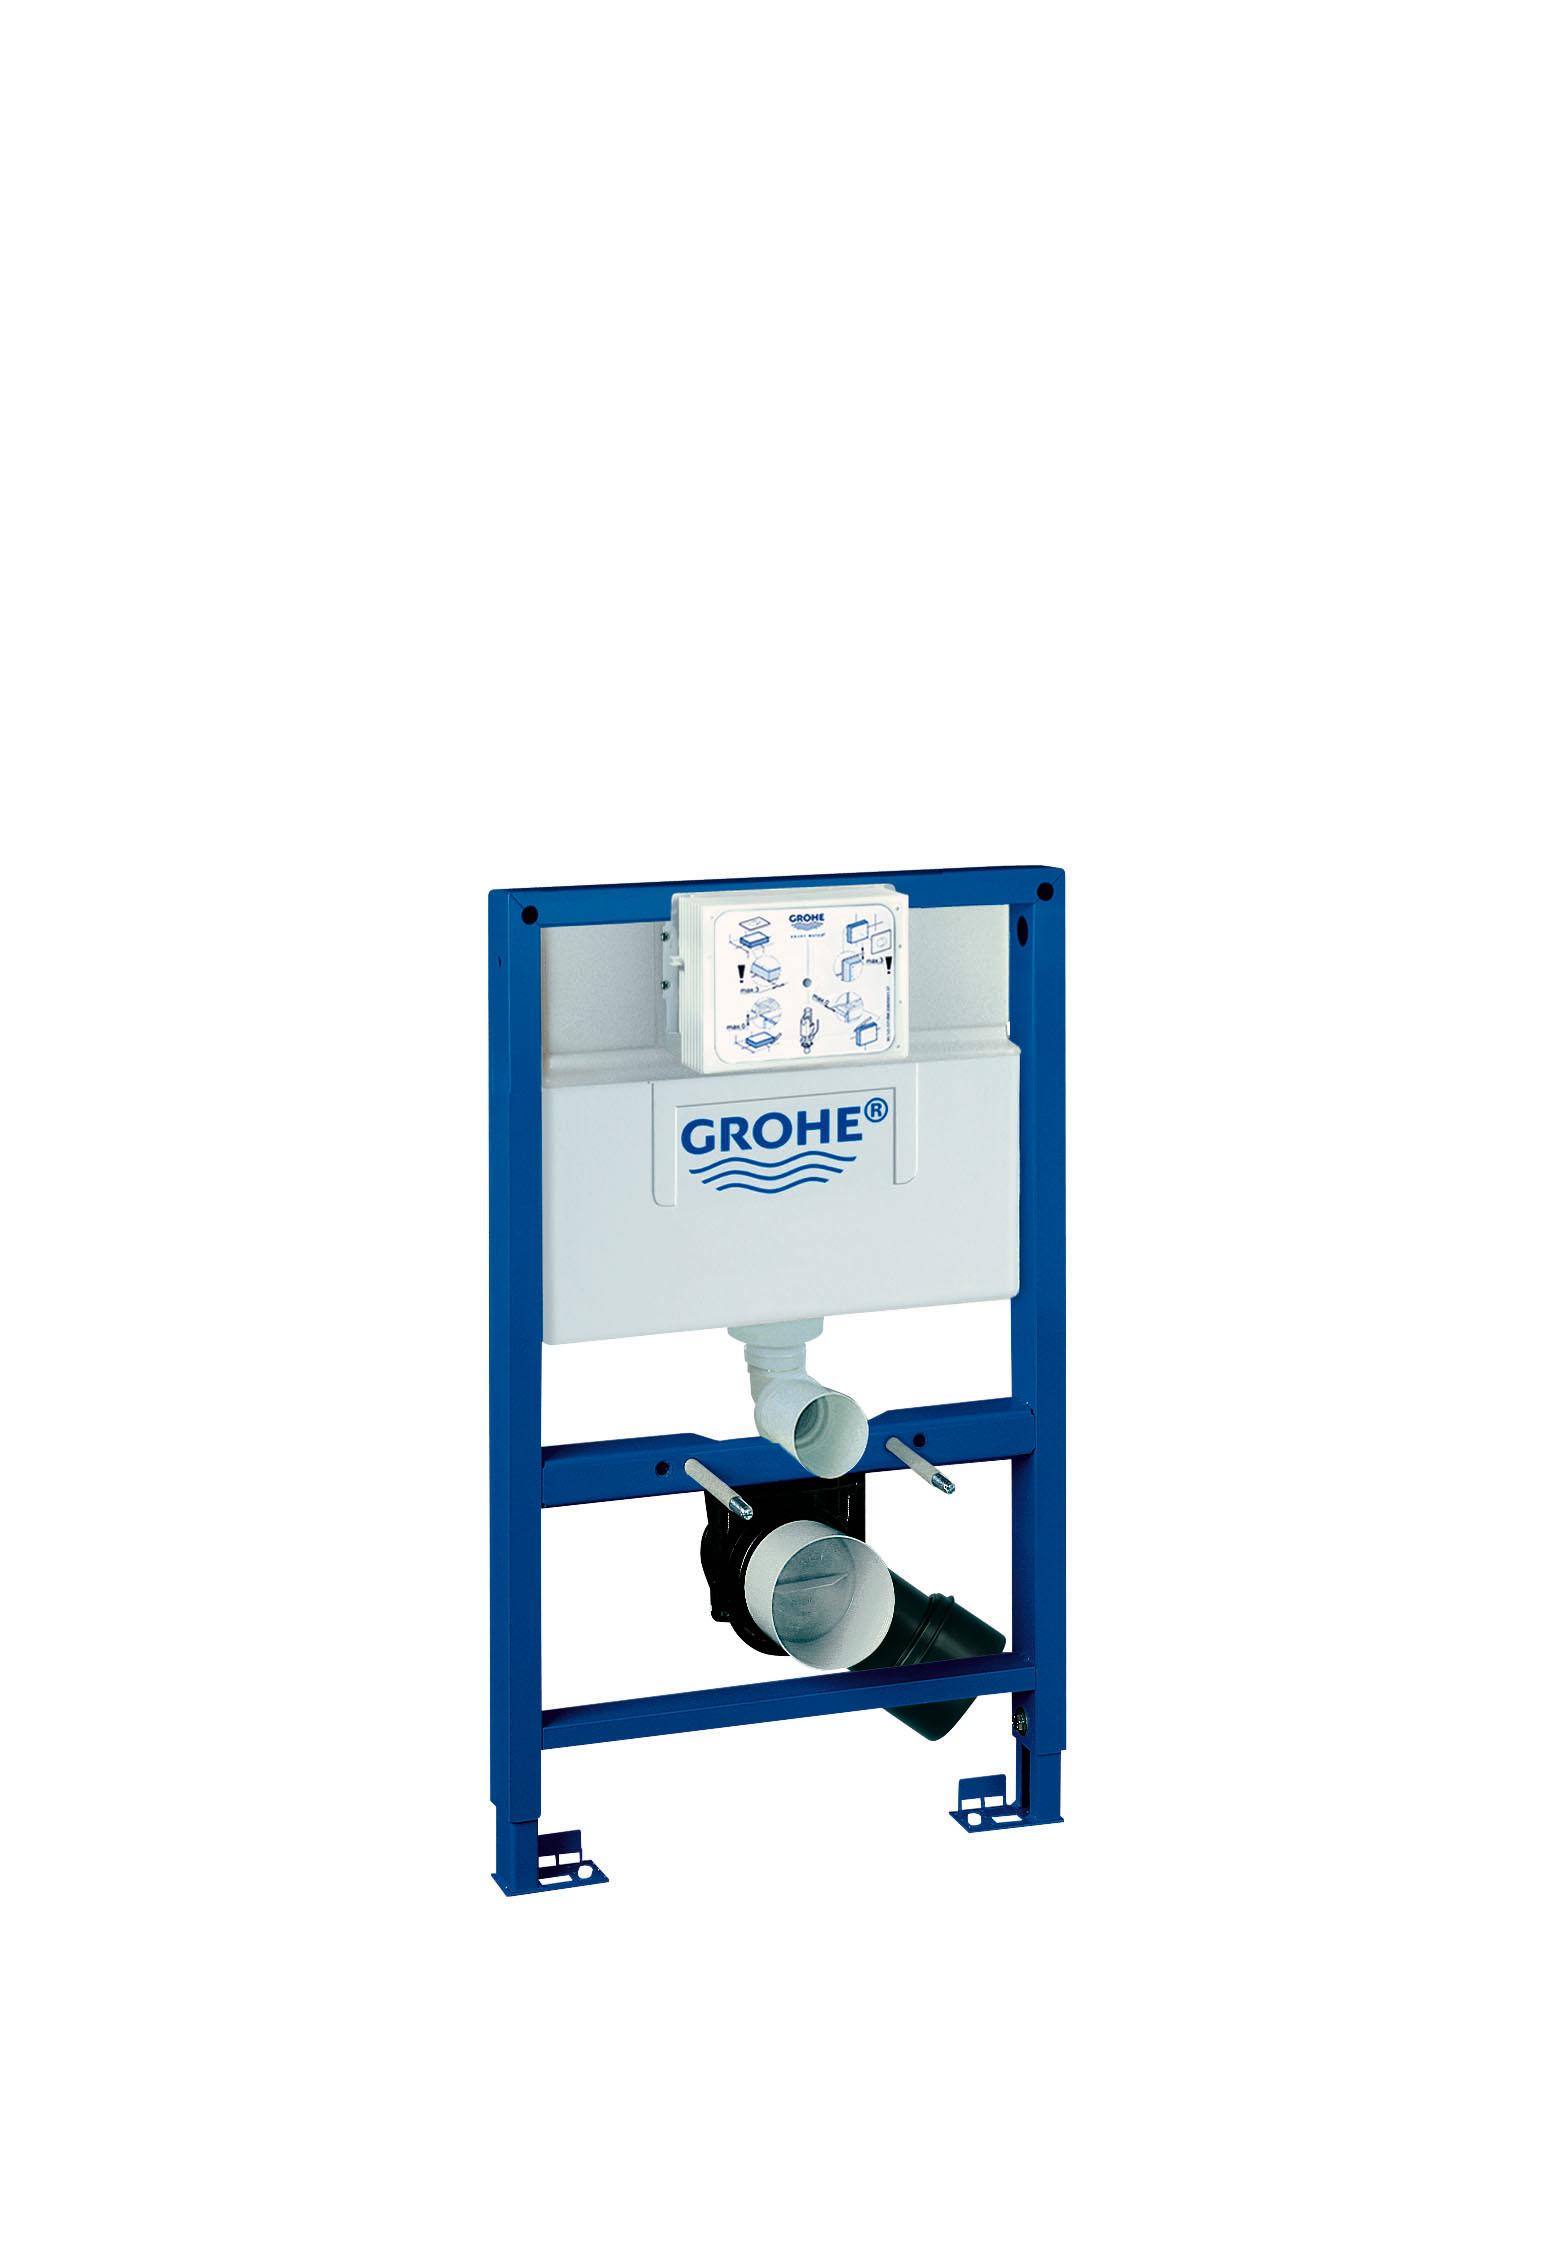 Инсталляция Grohe Rapid sl 38526000 инсталляция grohe rapid sl для унитаза 38528001